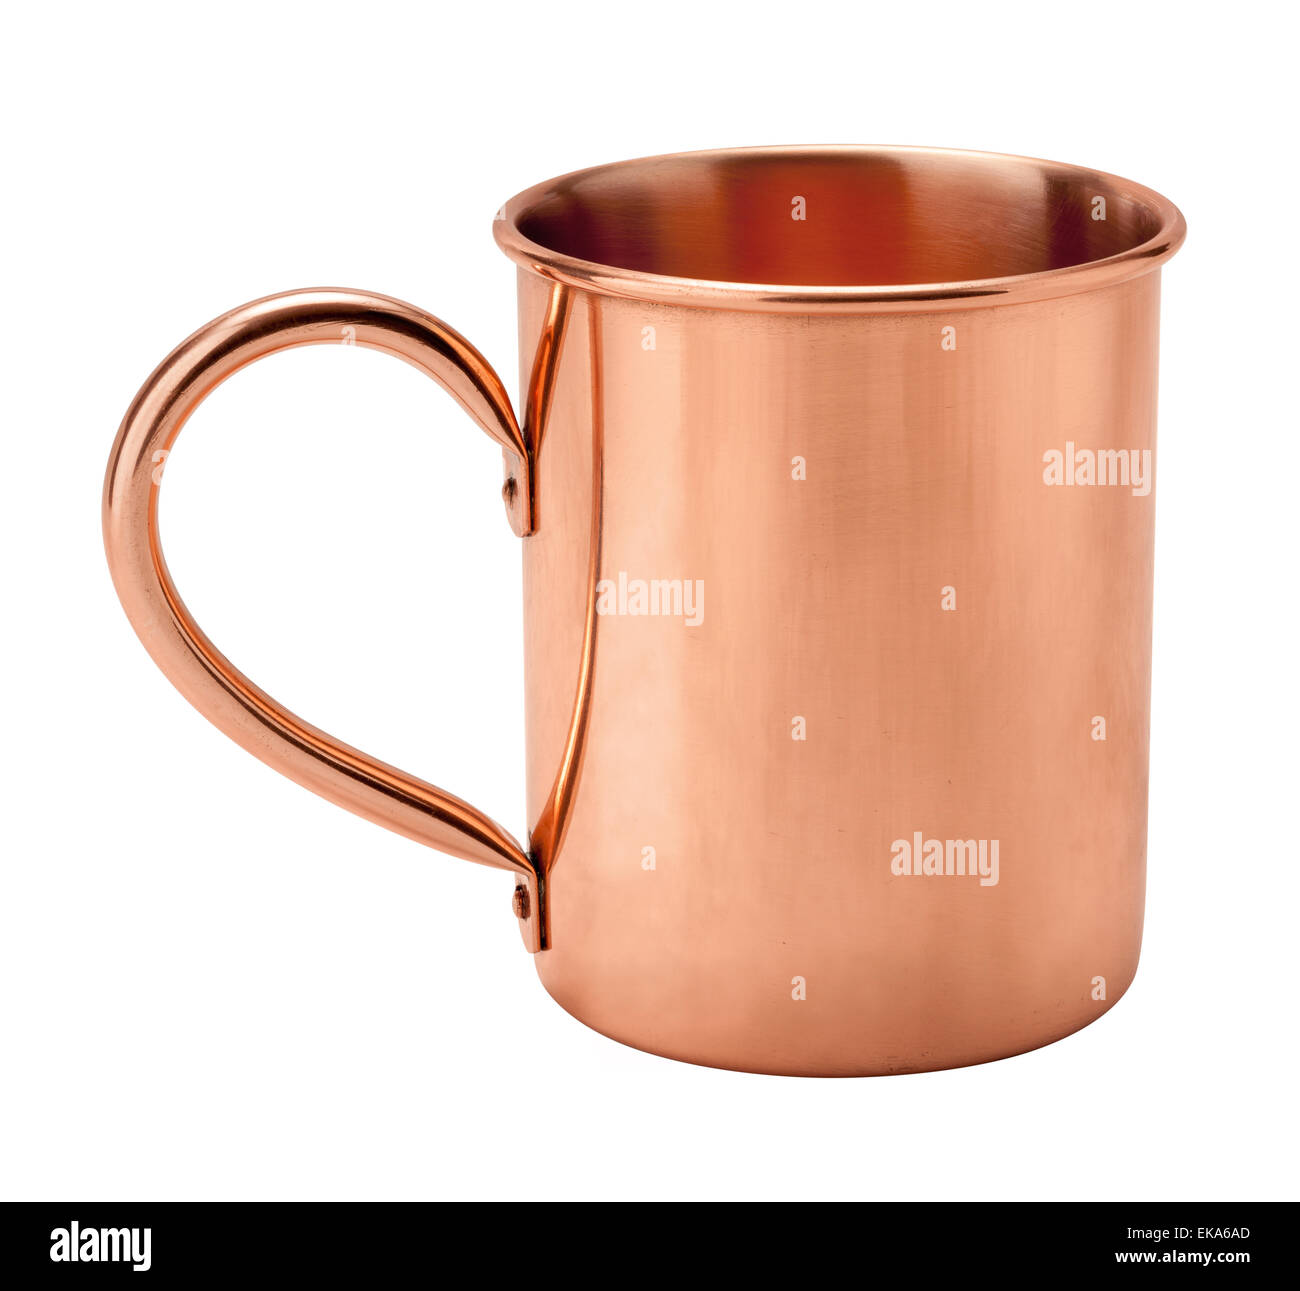 Vintage Copper Mug showing the handle. - Stock Image